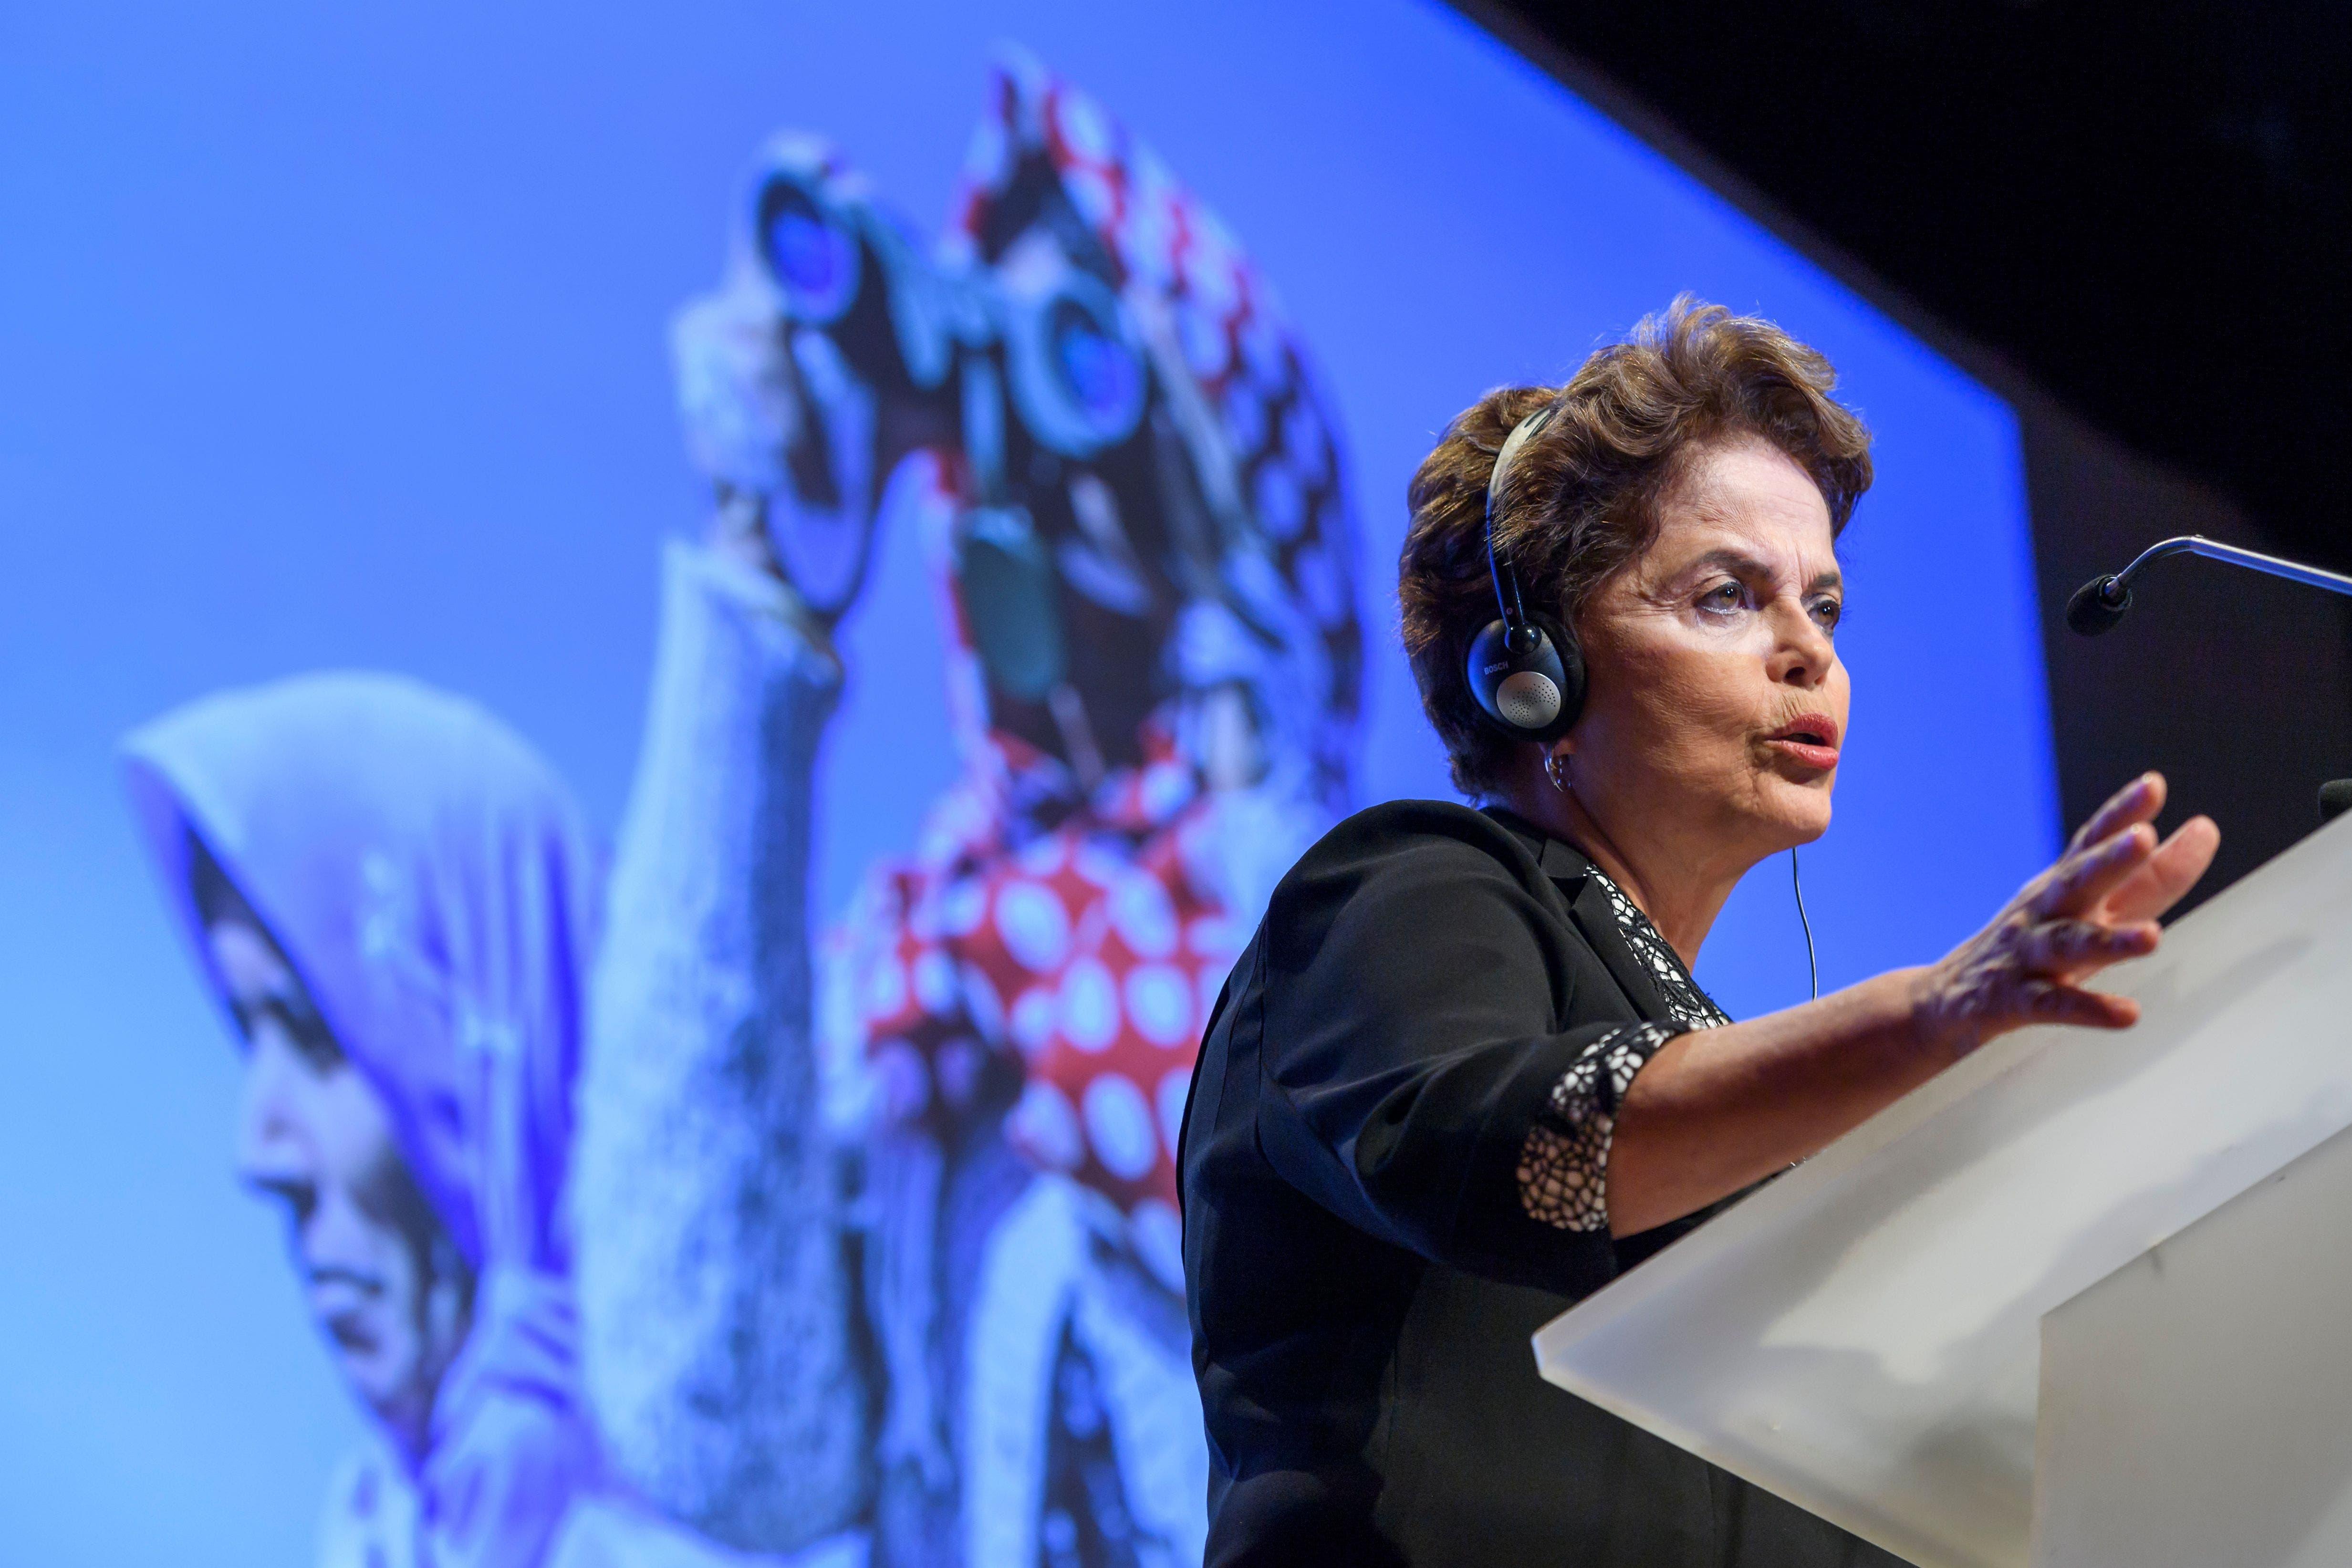 Dilma Rousseff reitera que no recibió sobornos de Odebrecht para su campaña